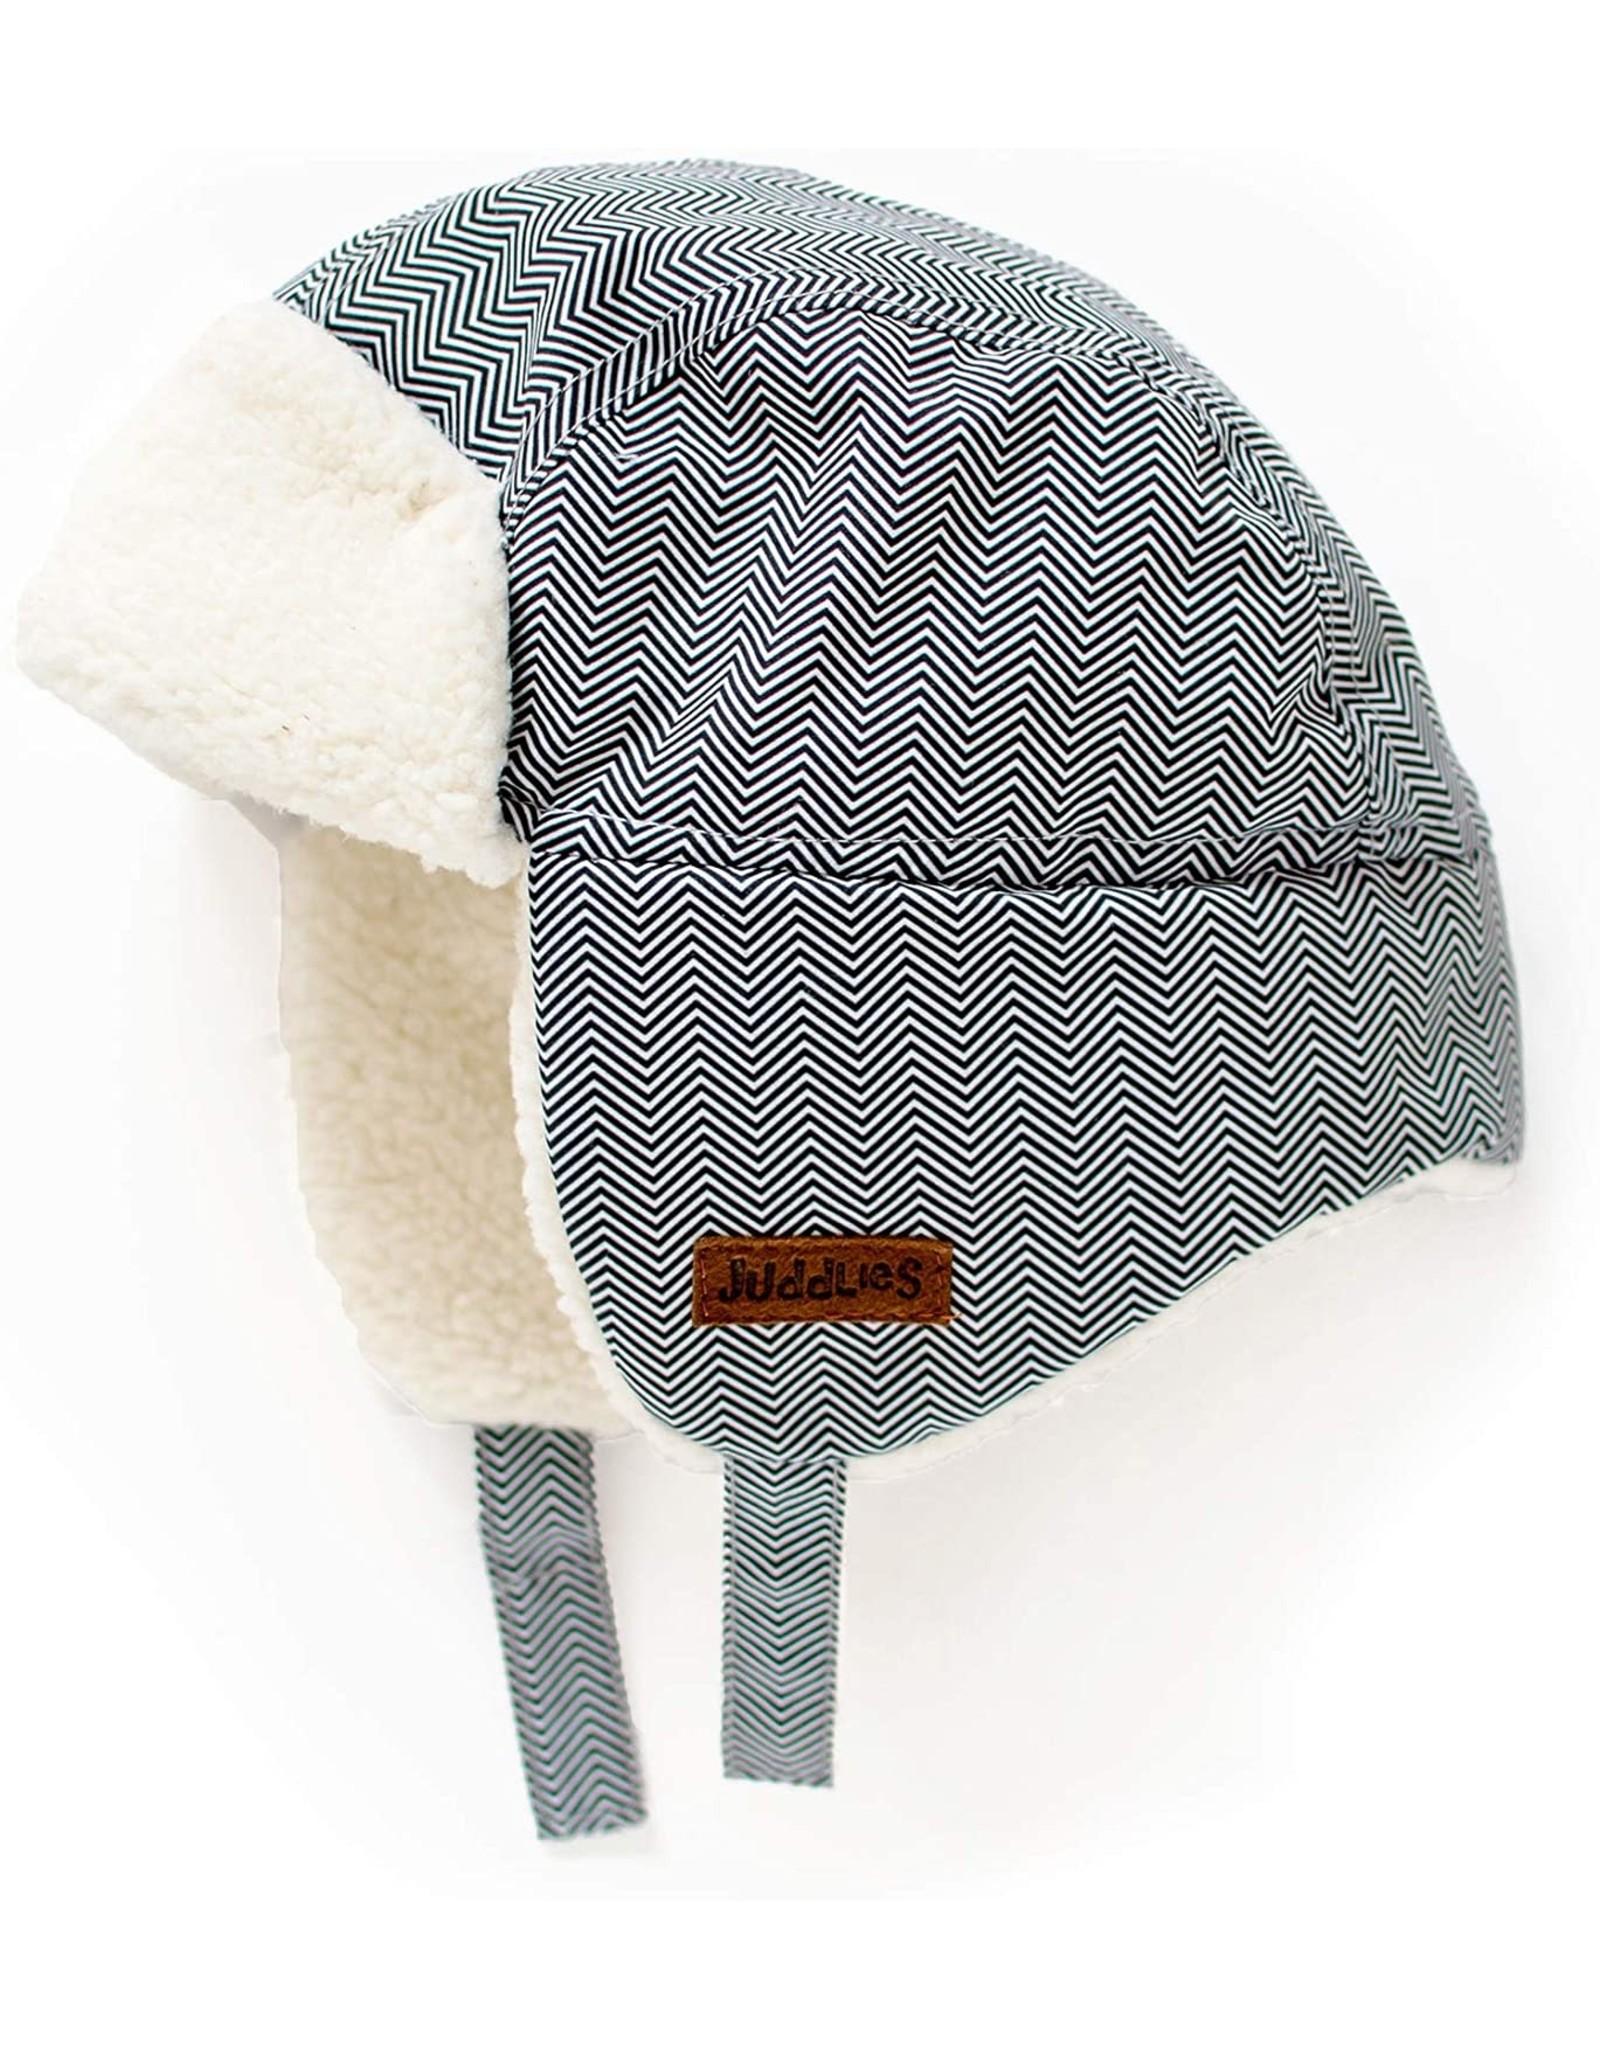 Juddlies Juddlies Winter Hat Herringbone Grey 6-12M